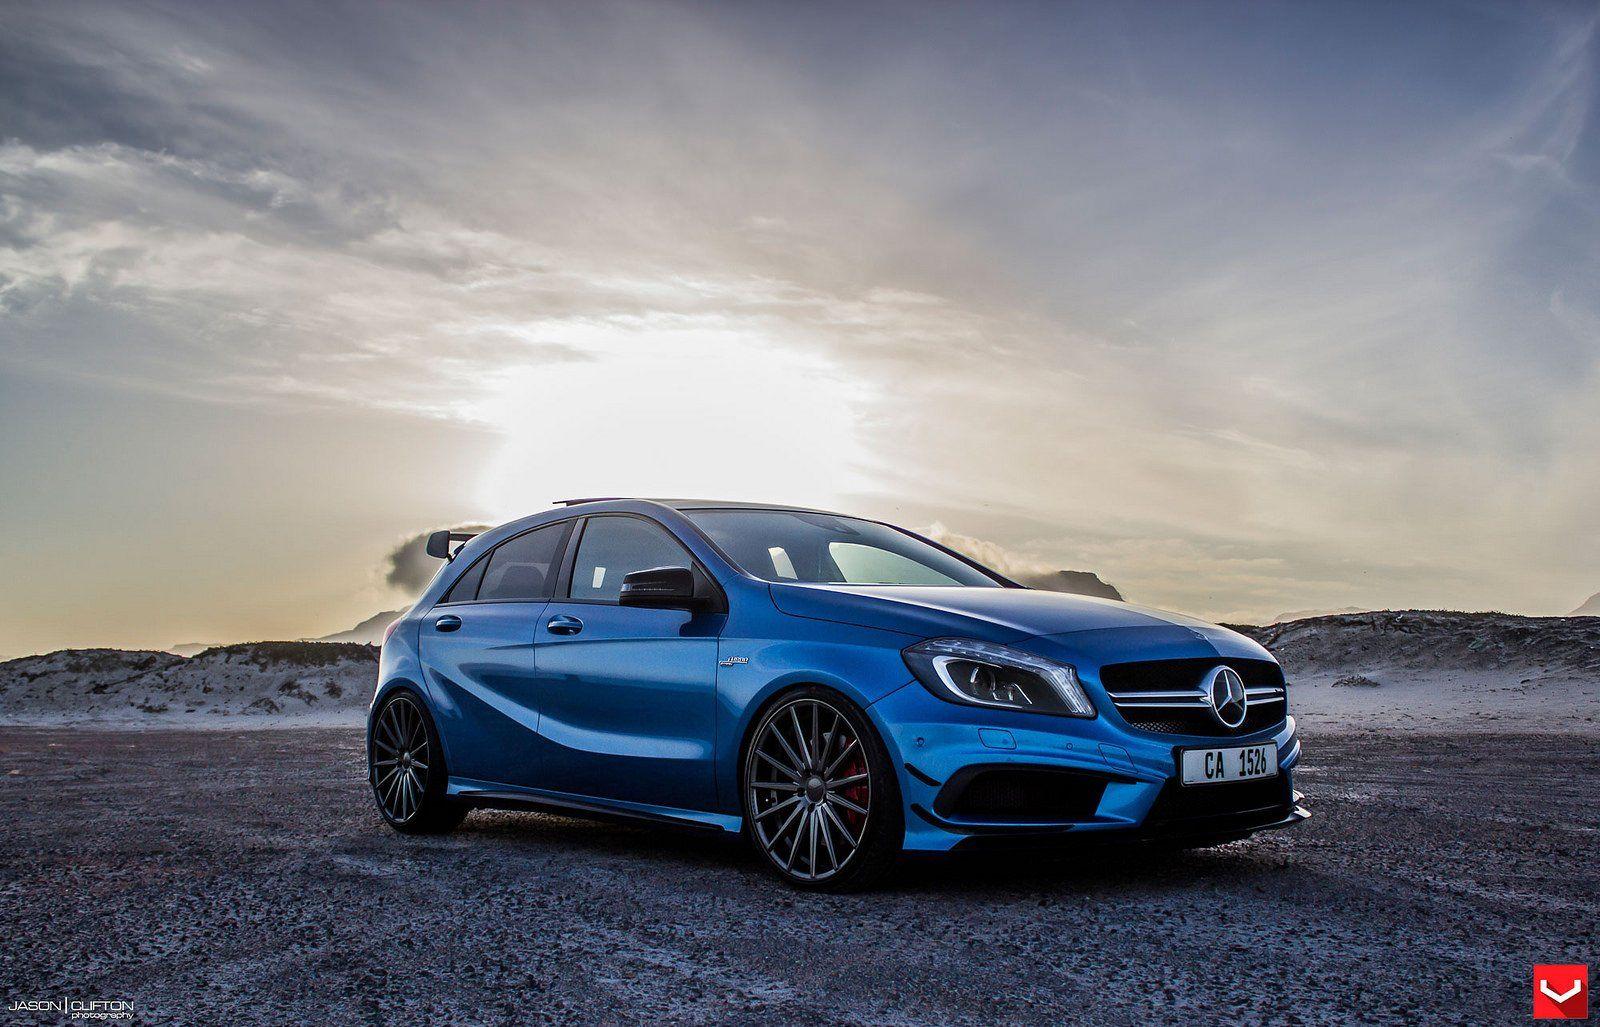 Vossen Wheels Mercedes A45 Amg Blue Tuning Cars Wallpaper Mercedes A45 Amg A45 Amg Mercedes A45